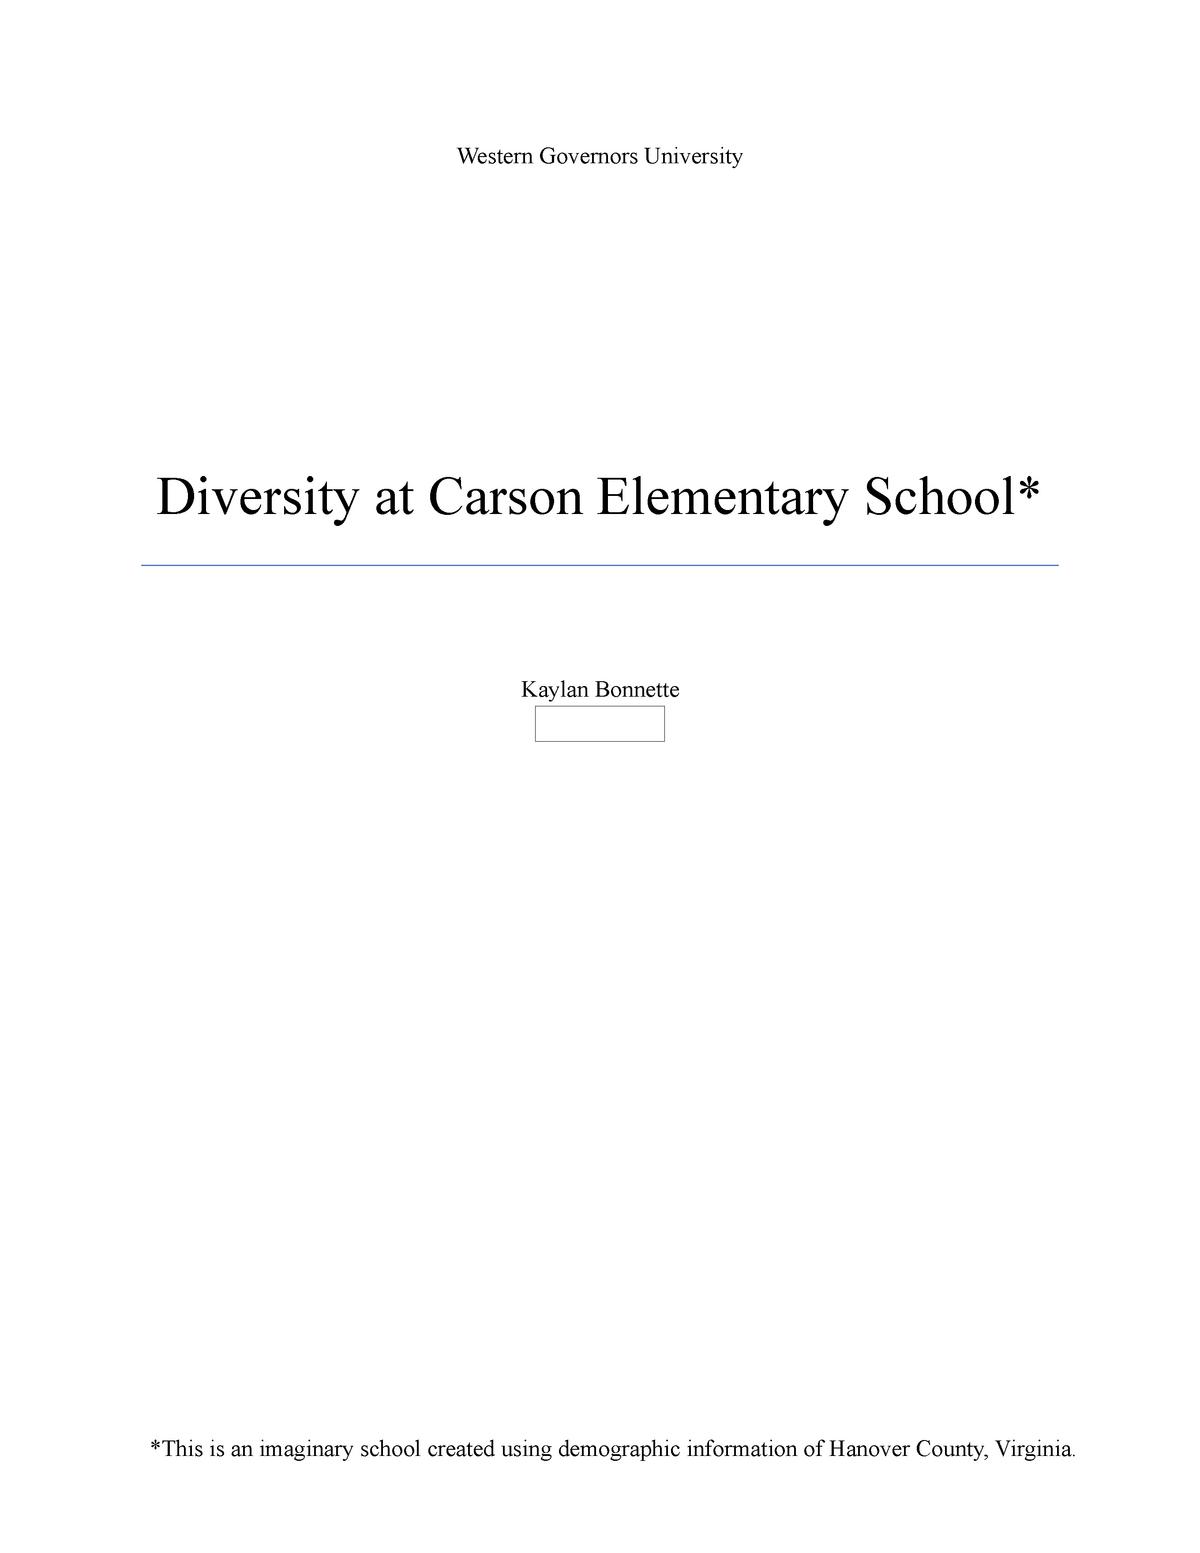 Task 2 - task 2 - EDUC 2240: Cultural Studies and Diversity - StuDocu